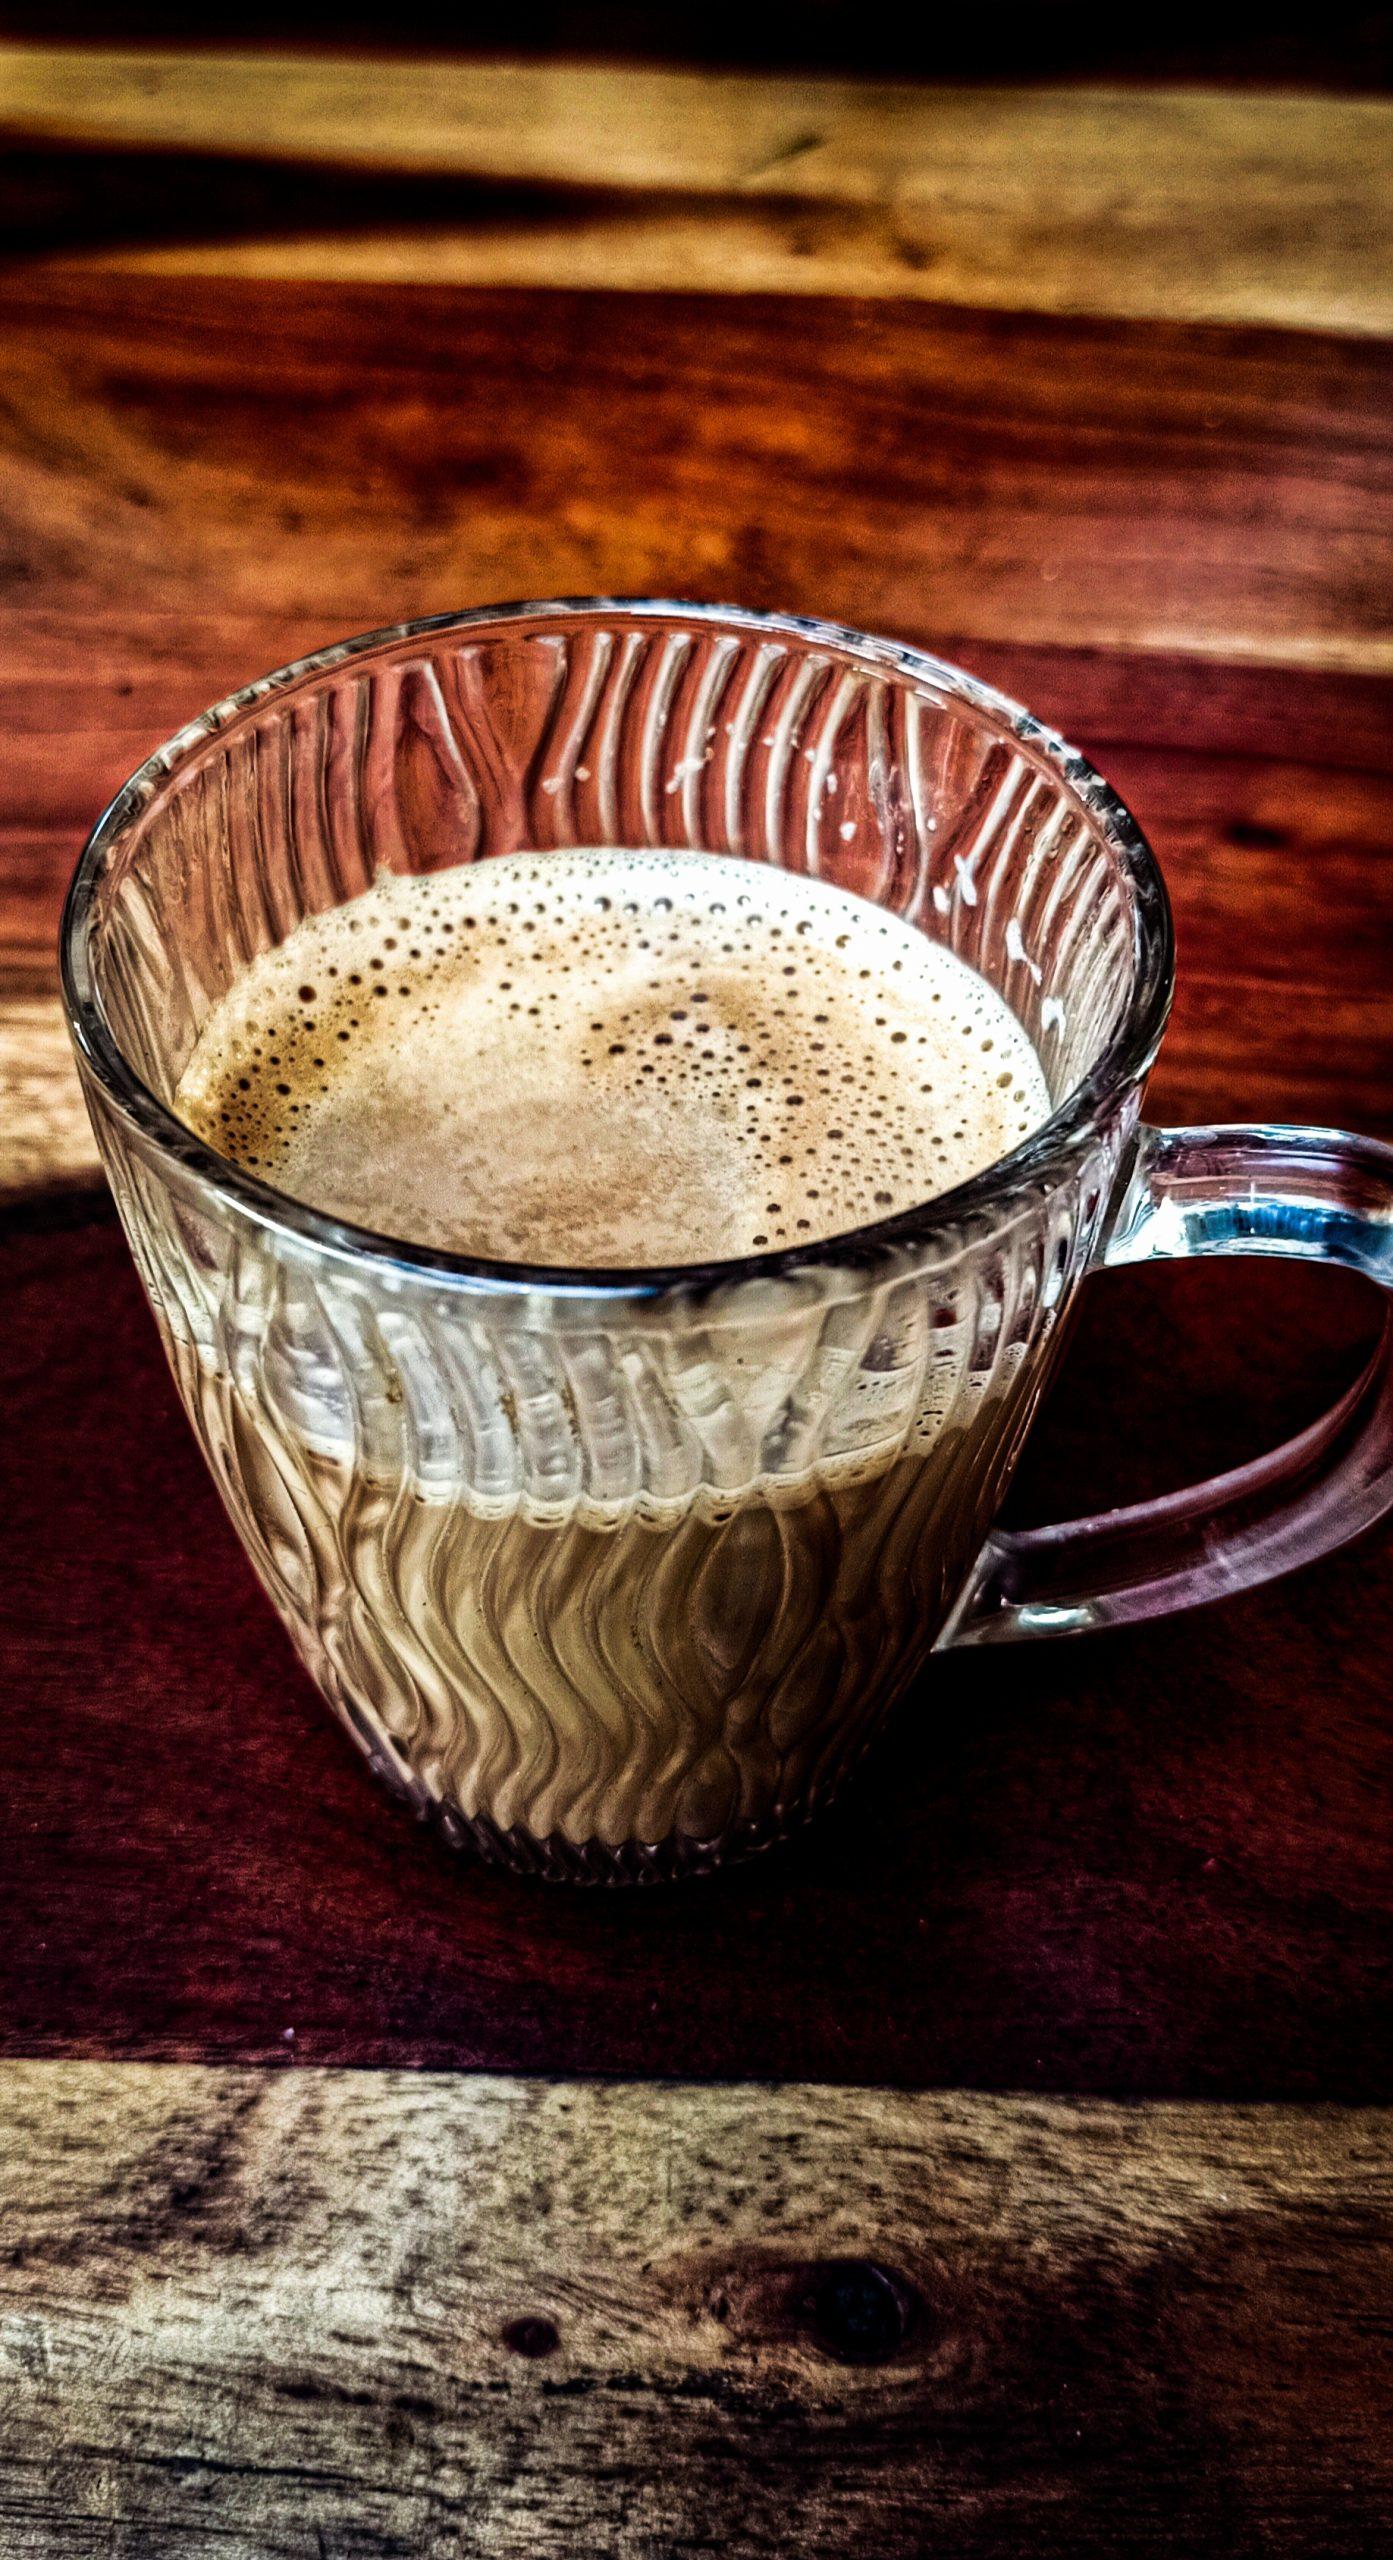 Coffee Close-up Photo